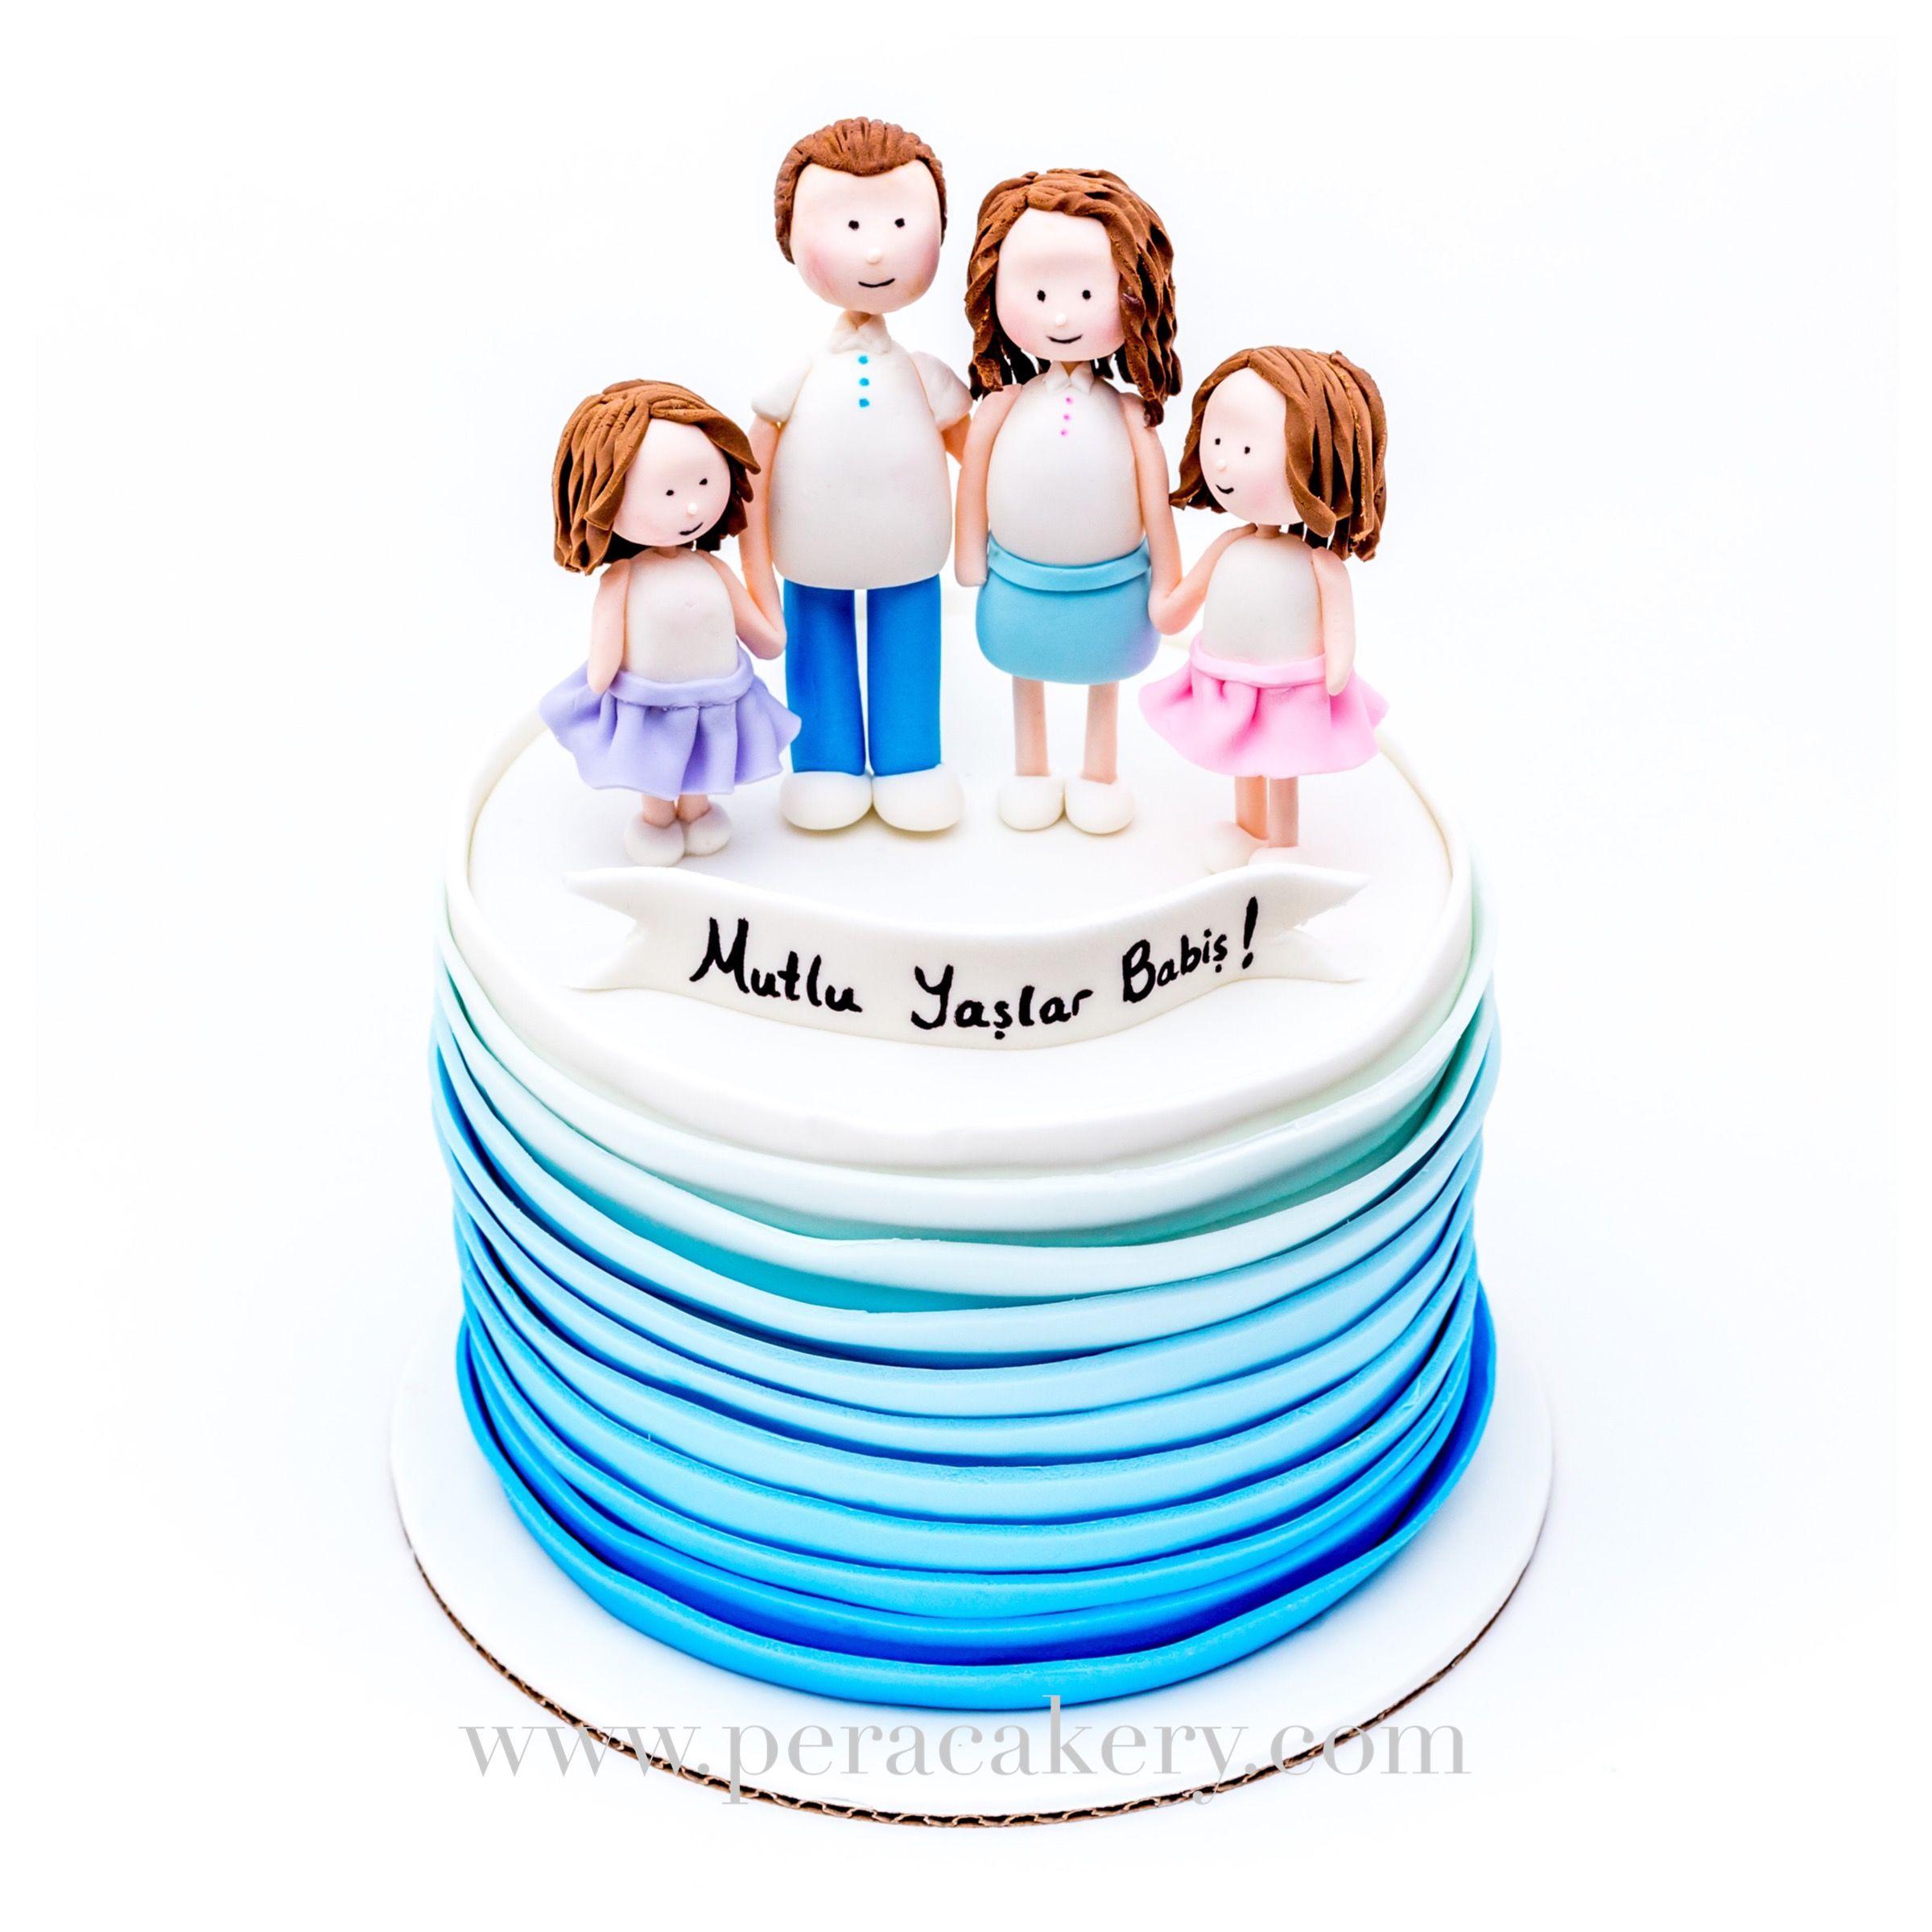 cute family ombre cake design pera cakery cakes pinterest